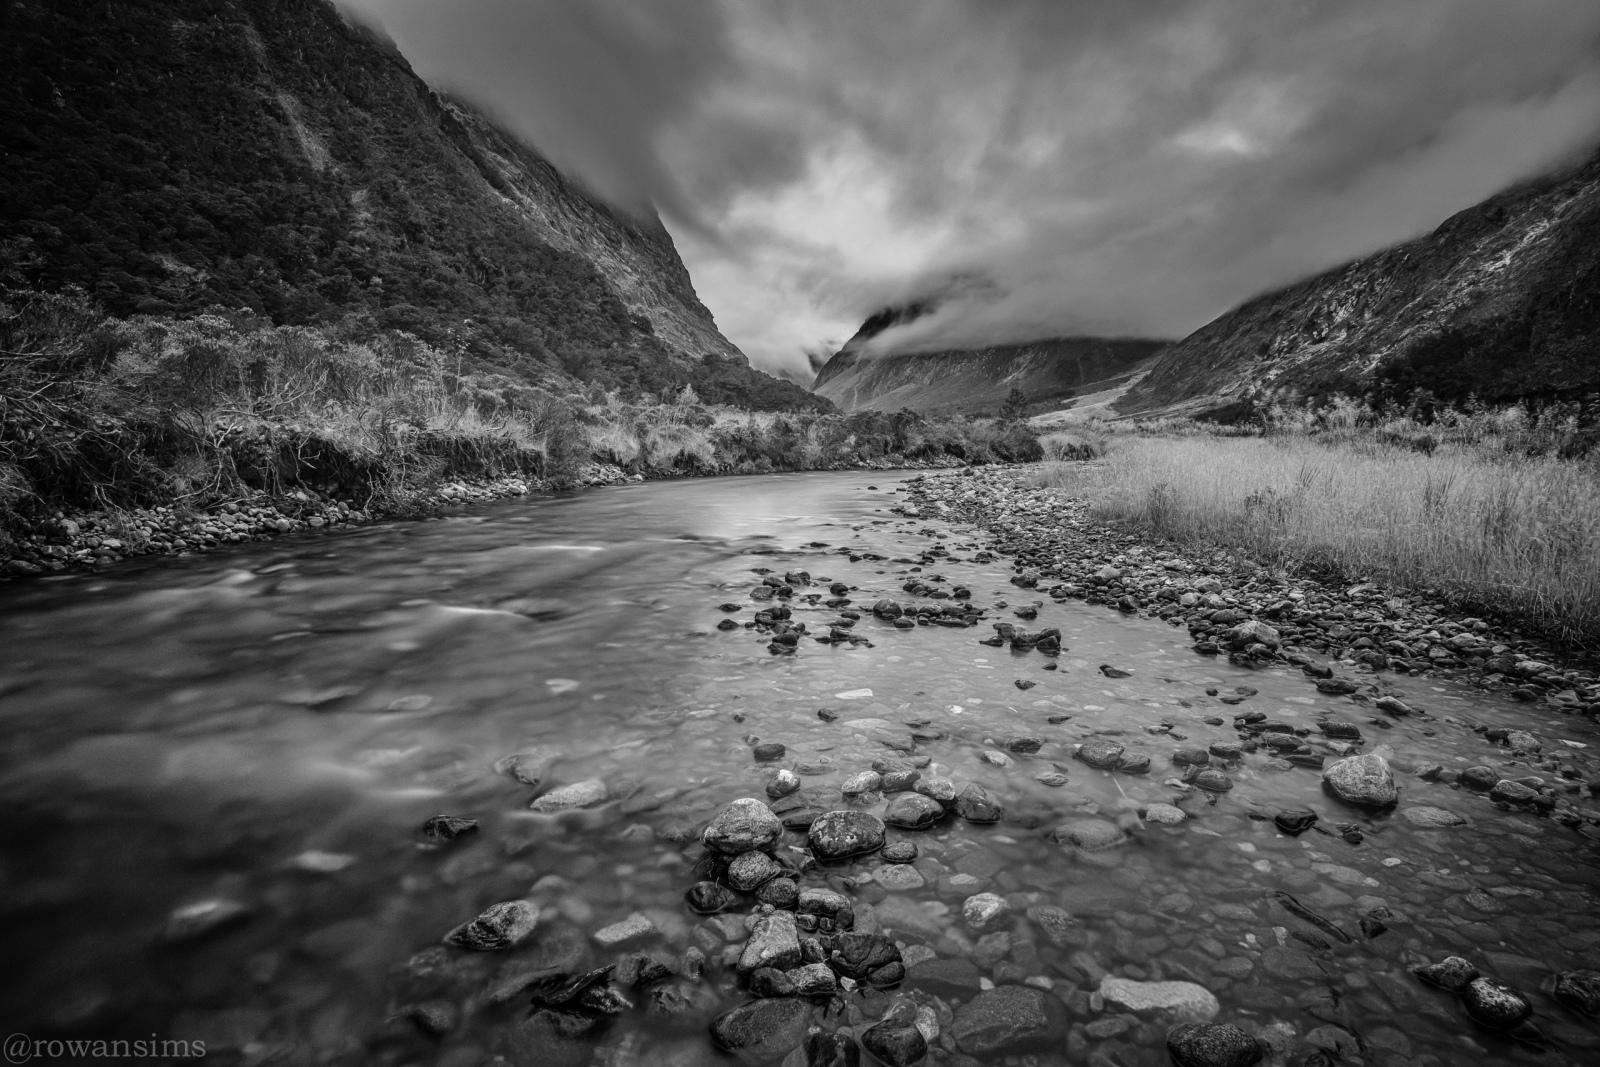 Landscape photo Monkey Creek road Milford Sound Fiordland New Zealand